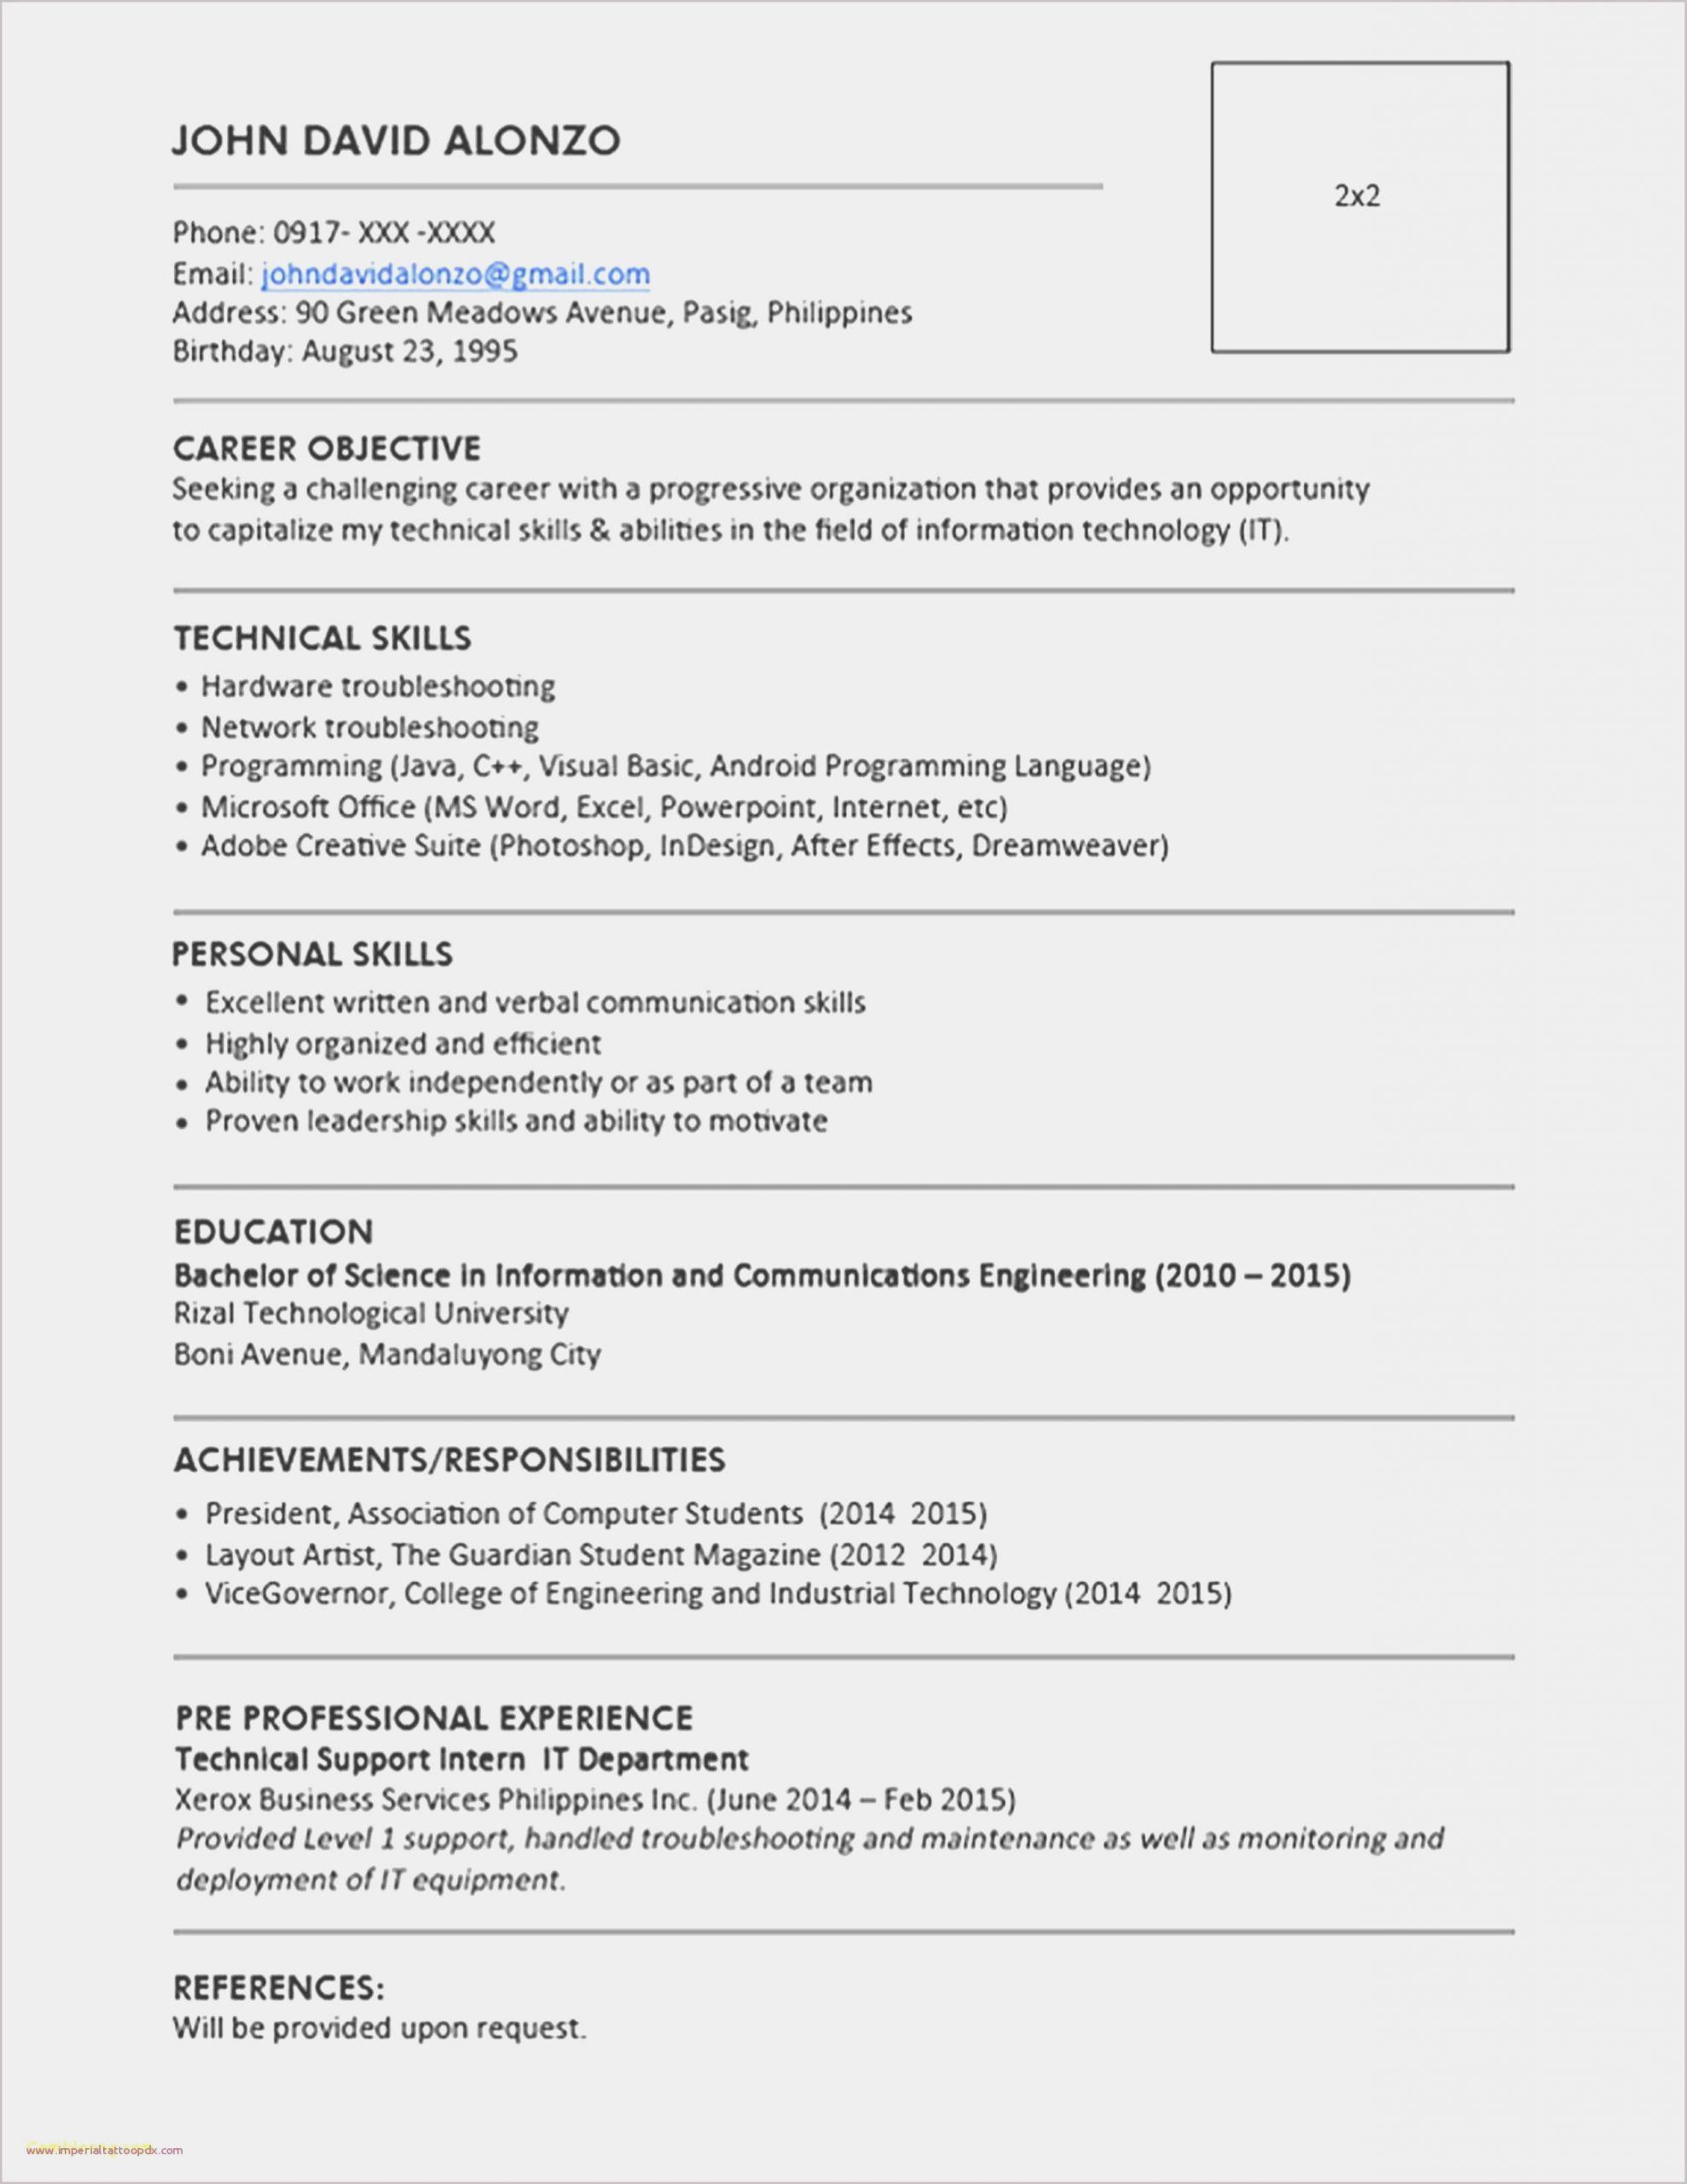 Nuik Noke Professional Resume Templates Word Free Download Indesign Resume Template Resume Template Free Resume Template Word